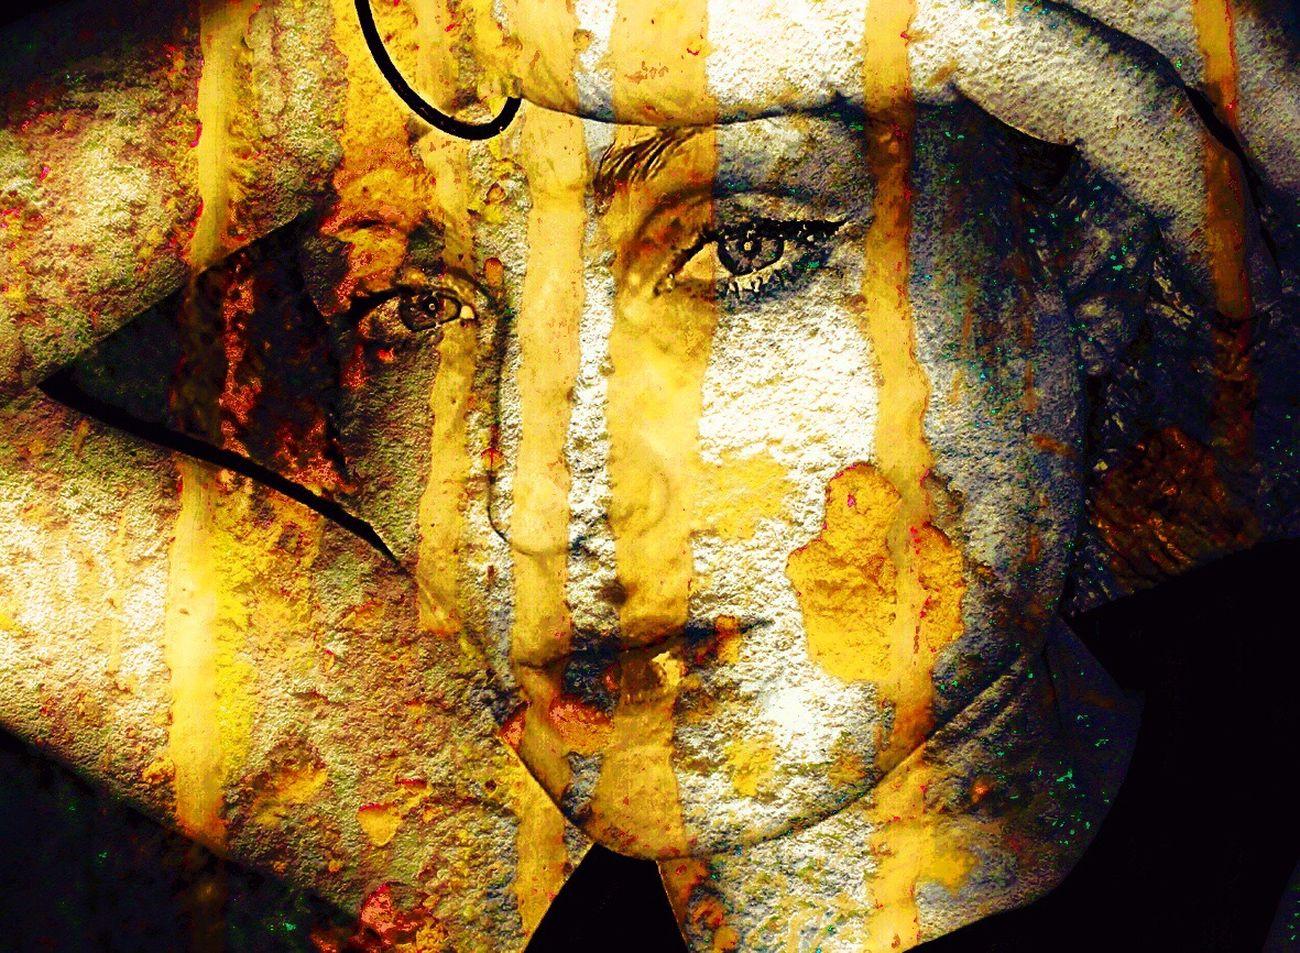 Sadness Lonely Eyes Reedit Re Edited Grunge_effect Woman Digitalart  Art Rebelpunk Digital Art Photo Manipulation Creative Photography Contemporary Art Imagination Photomanipulation Creative Photo Editing Fallen Angel Tears Re-edit Abstract Self Portrait Women Of EyeEm Scotland